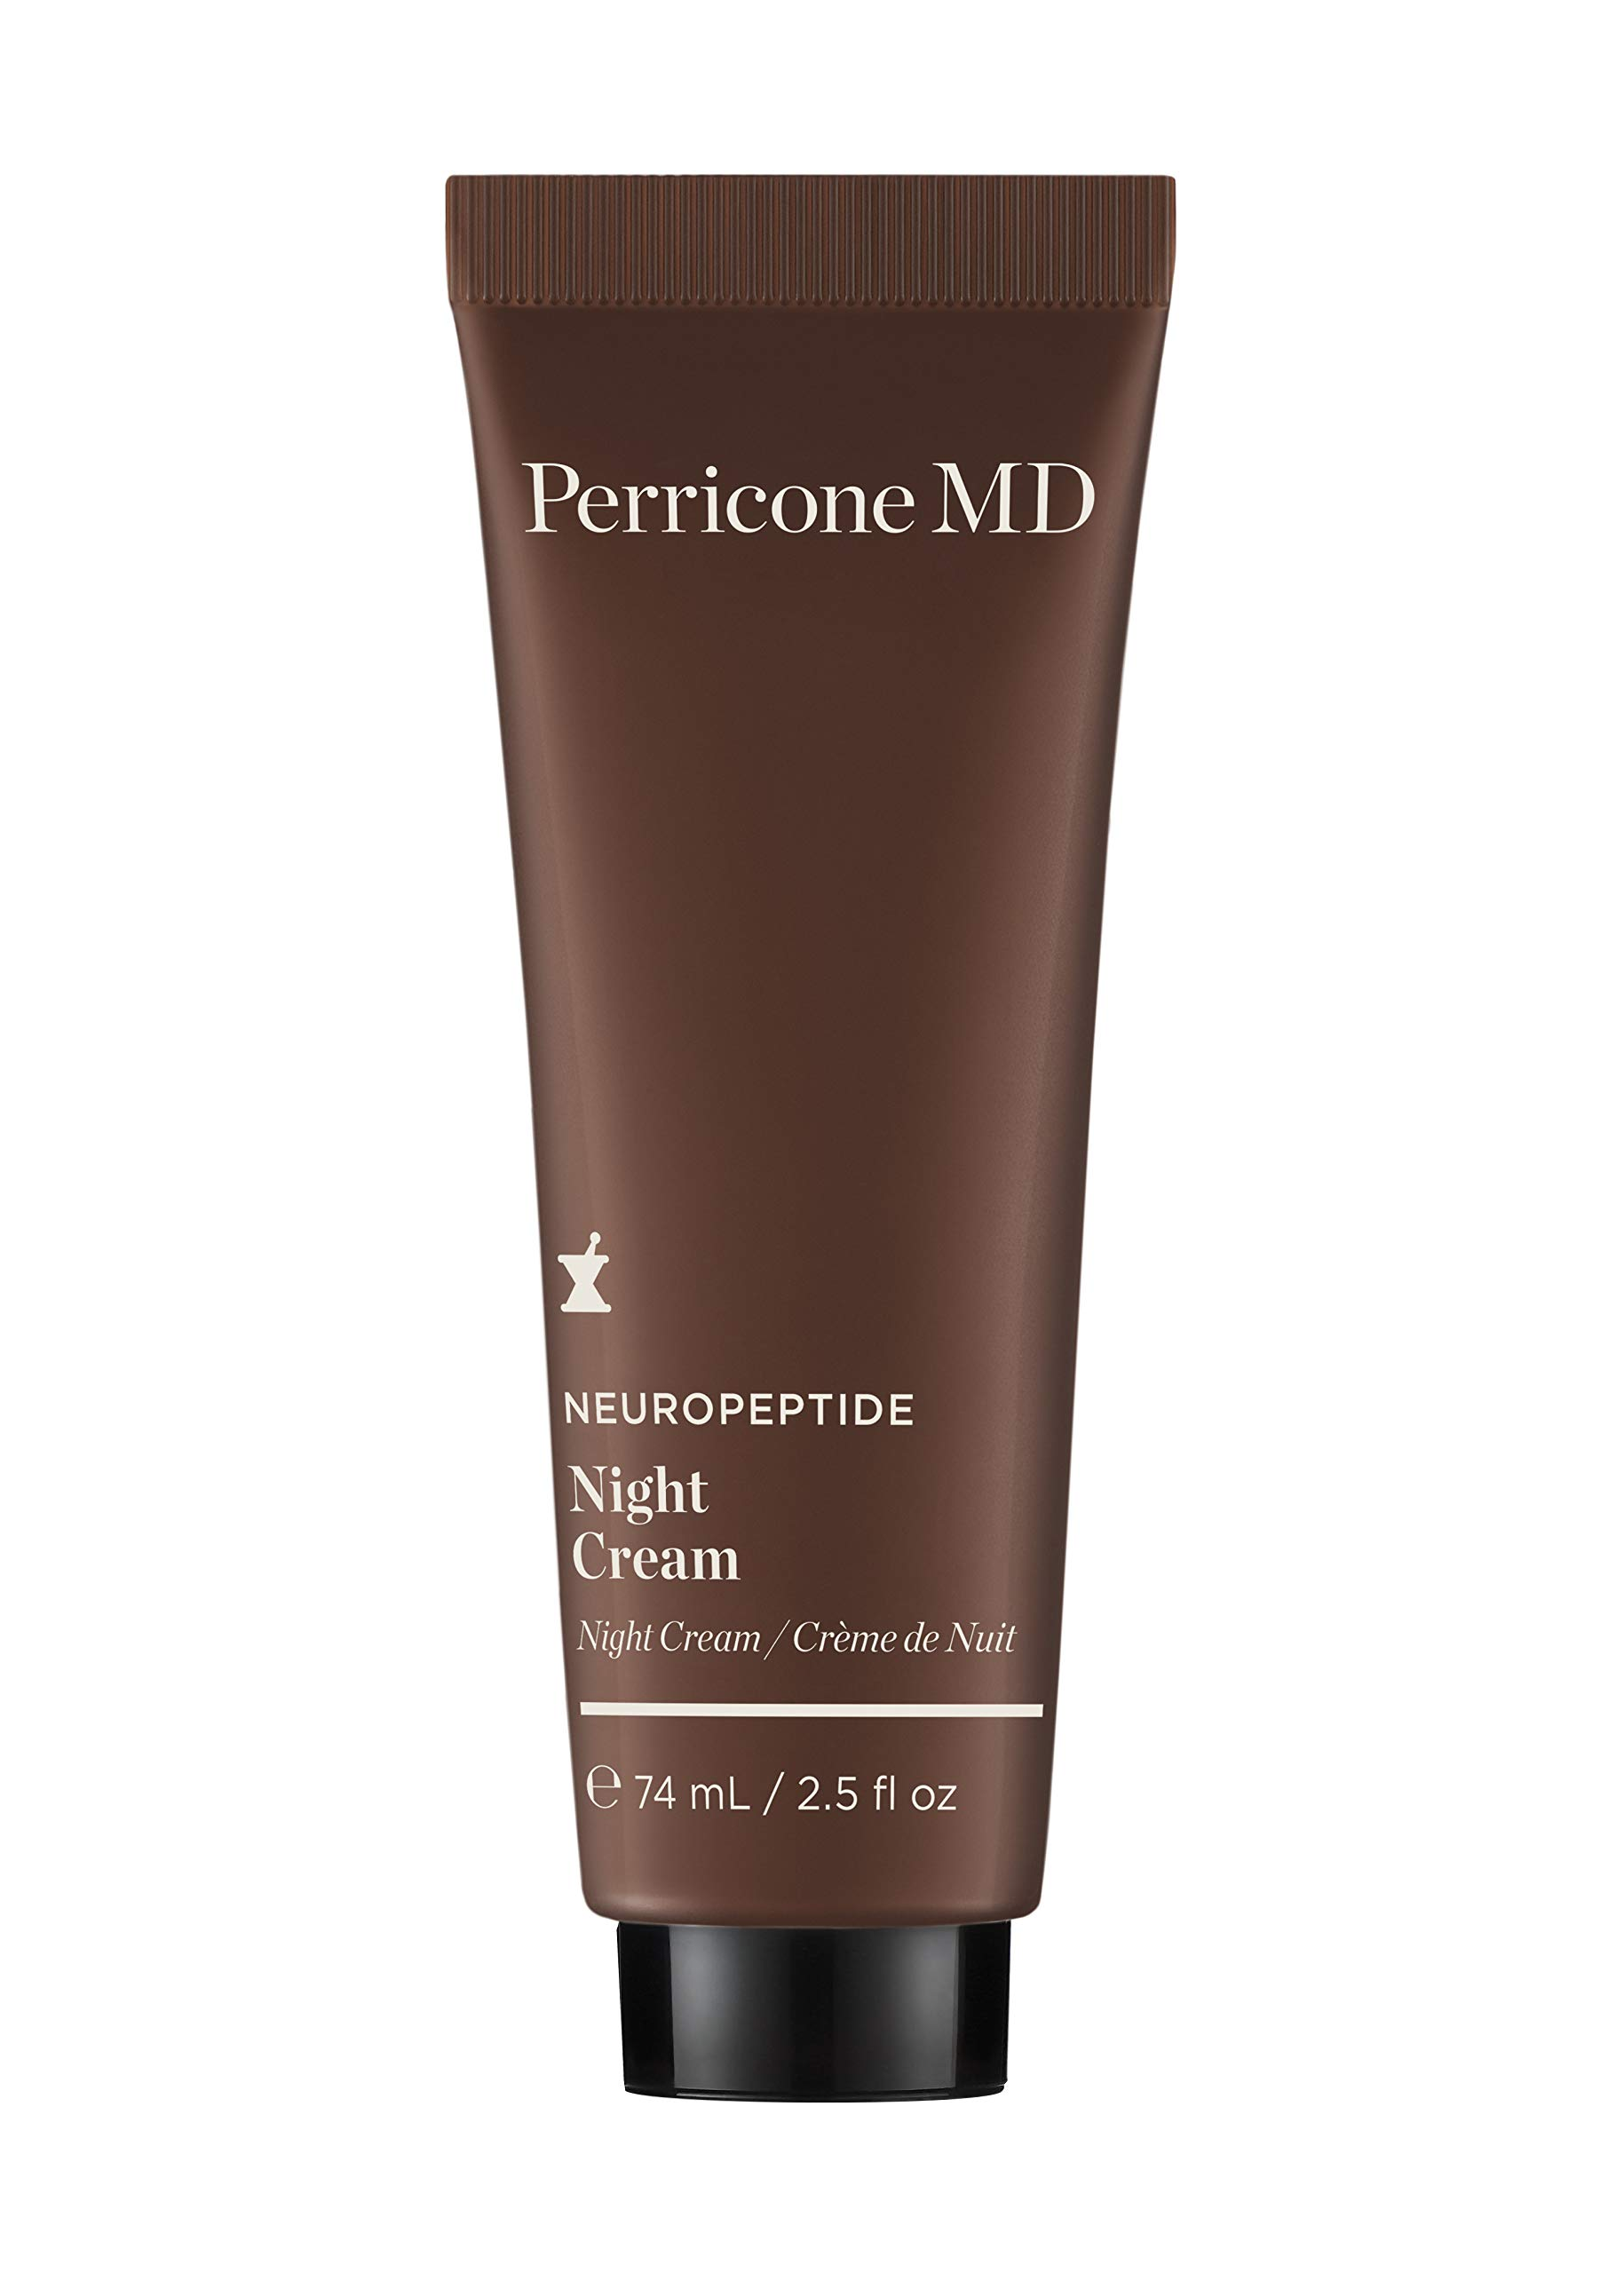 Perricone MD Neuropeptide Night Cream, 2.5 Ounce